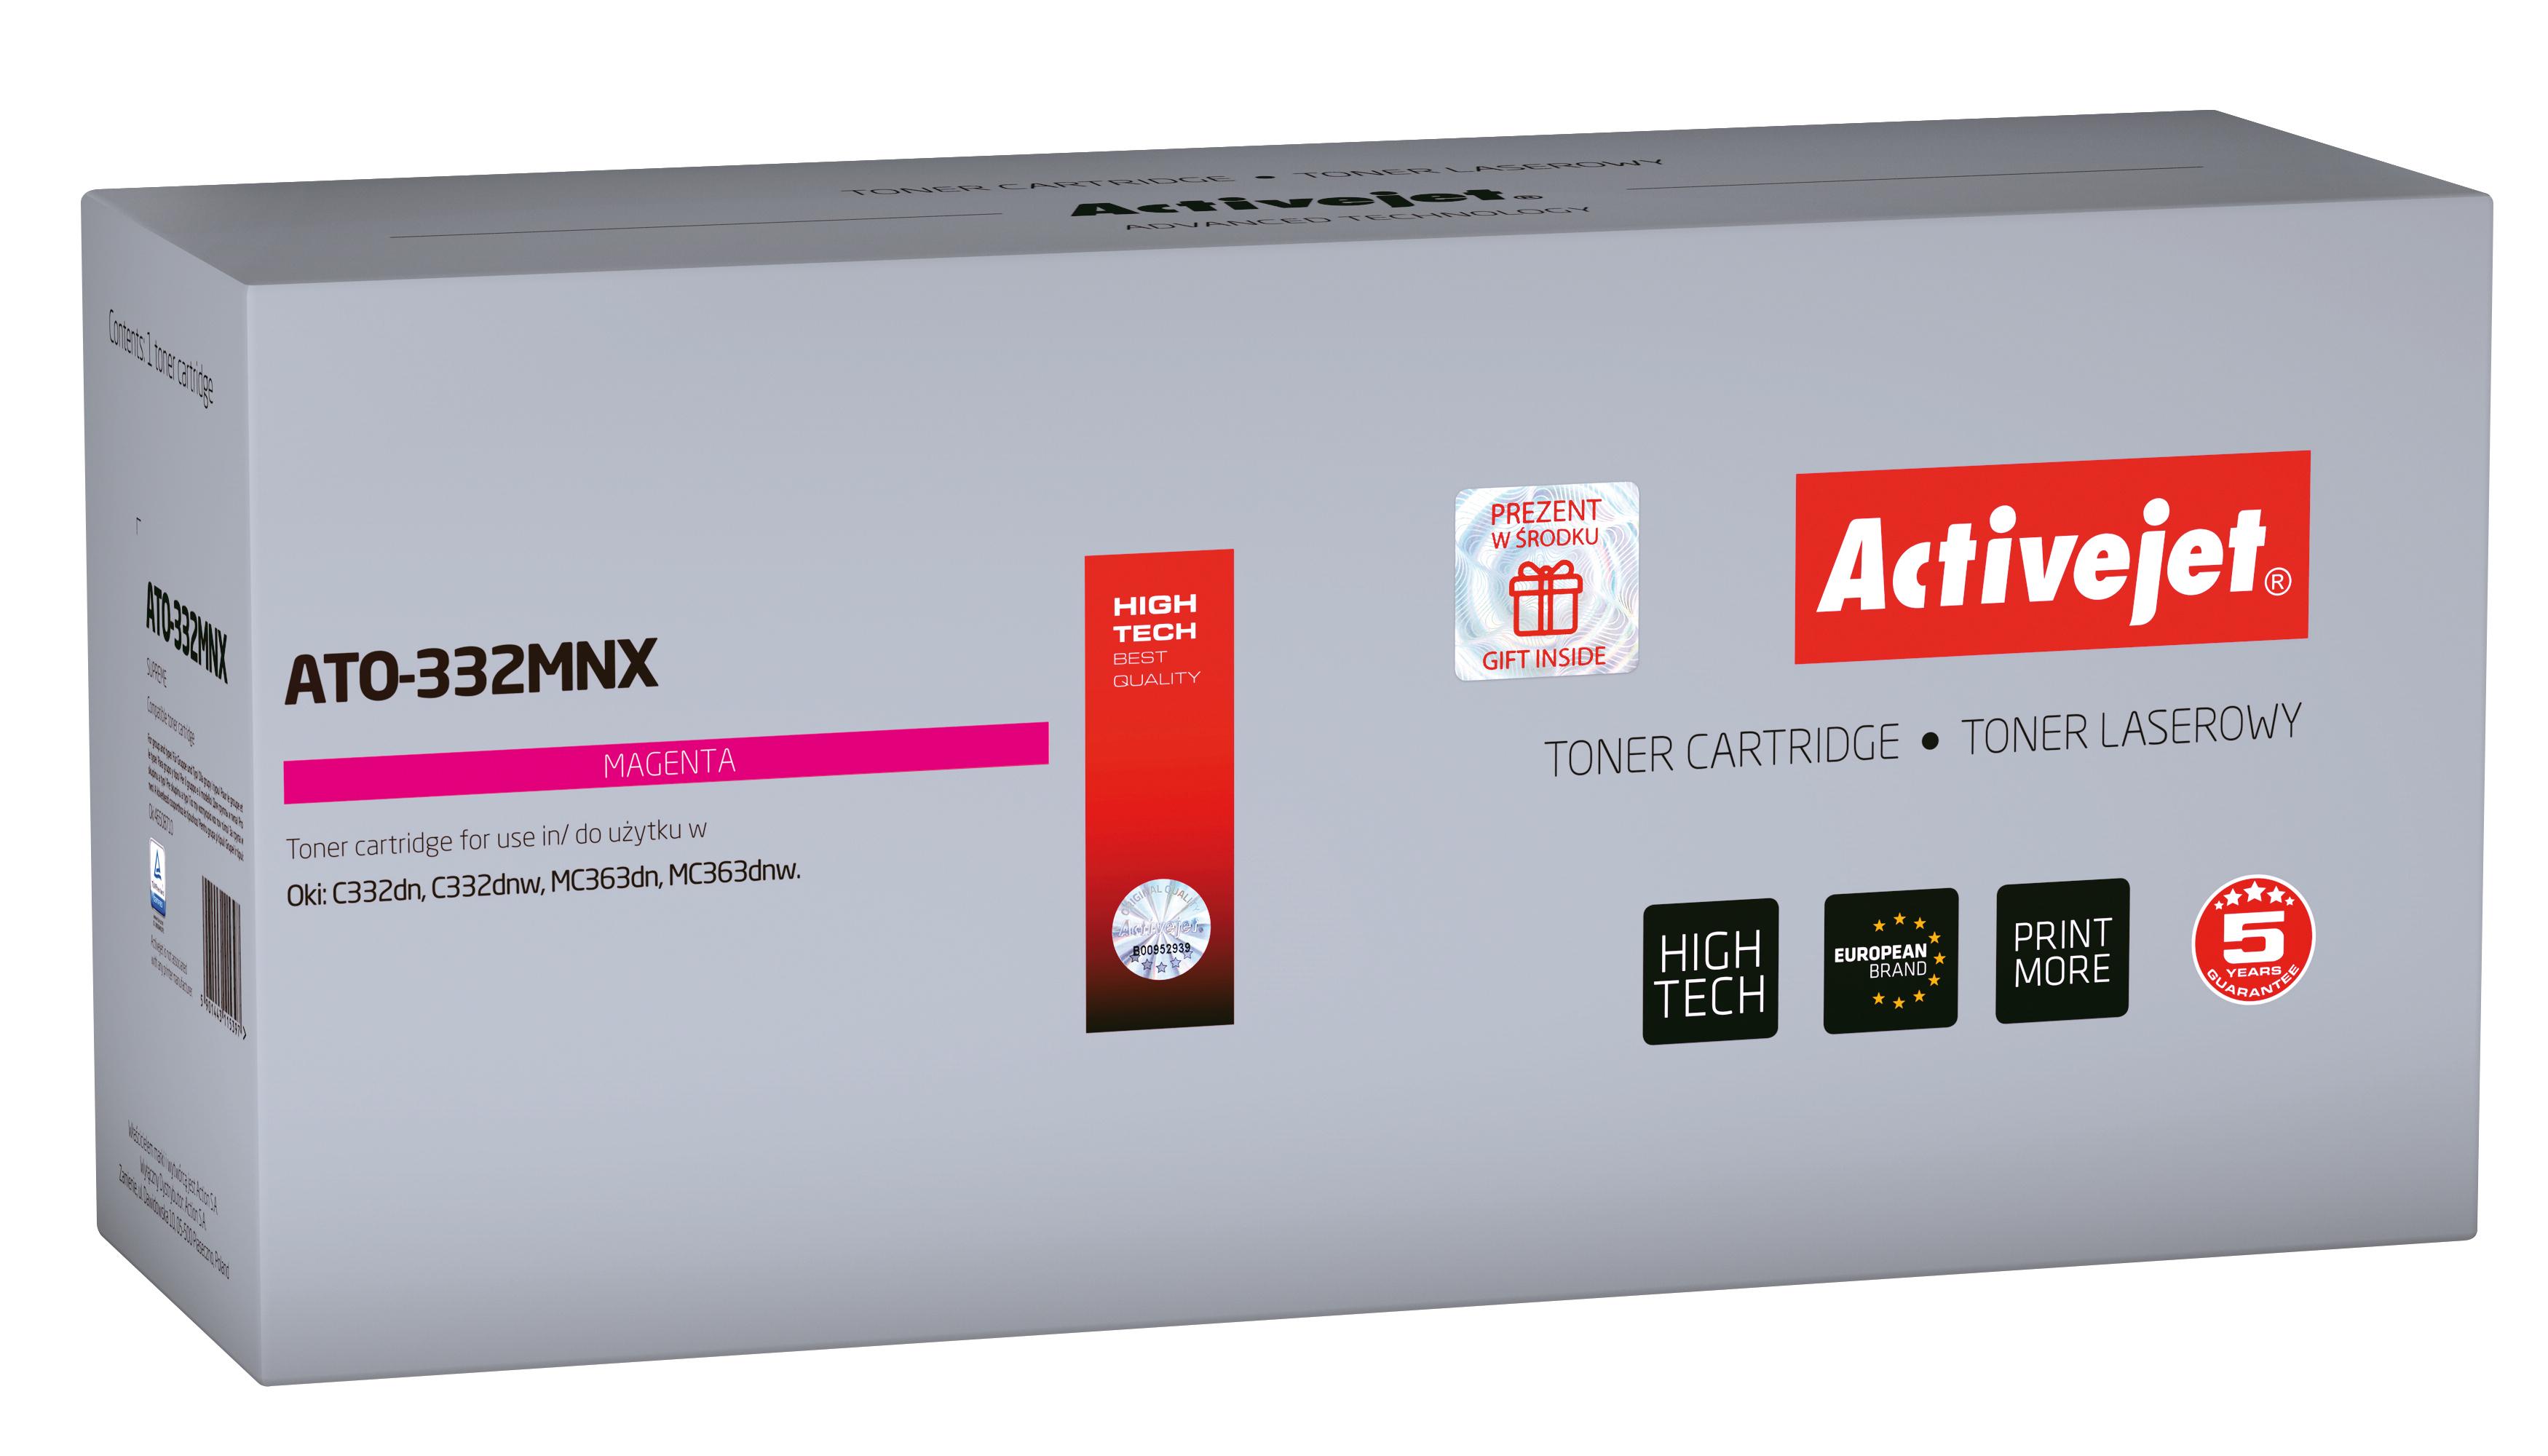 Toner Activejet  ATO-332MNX do drukarki OKI, Zamiennik OKI 46508710; Supreme; 3000 stron; Purpurowy.